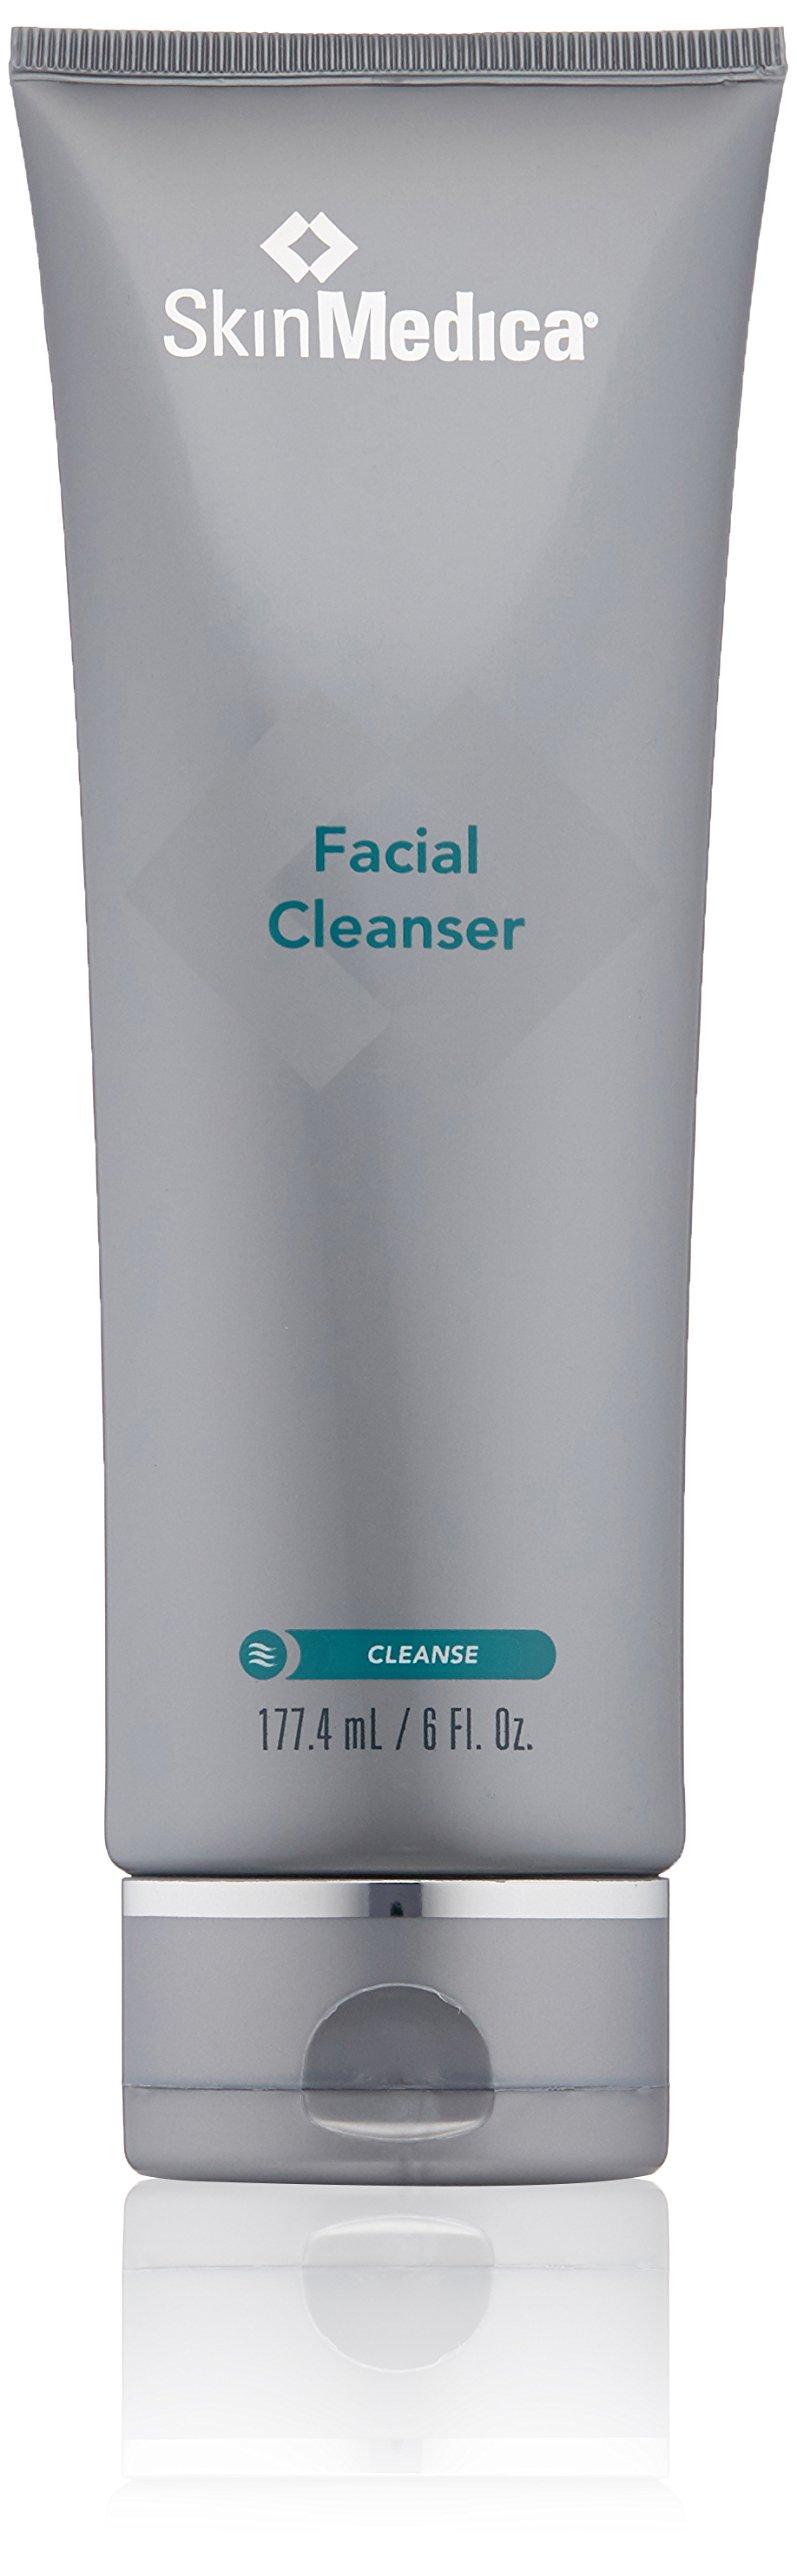 SkinMedica Facial Cleanser, 6 oz.